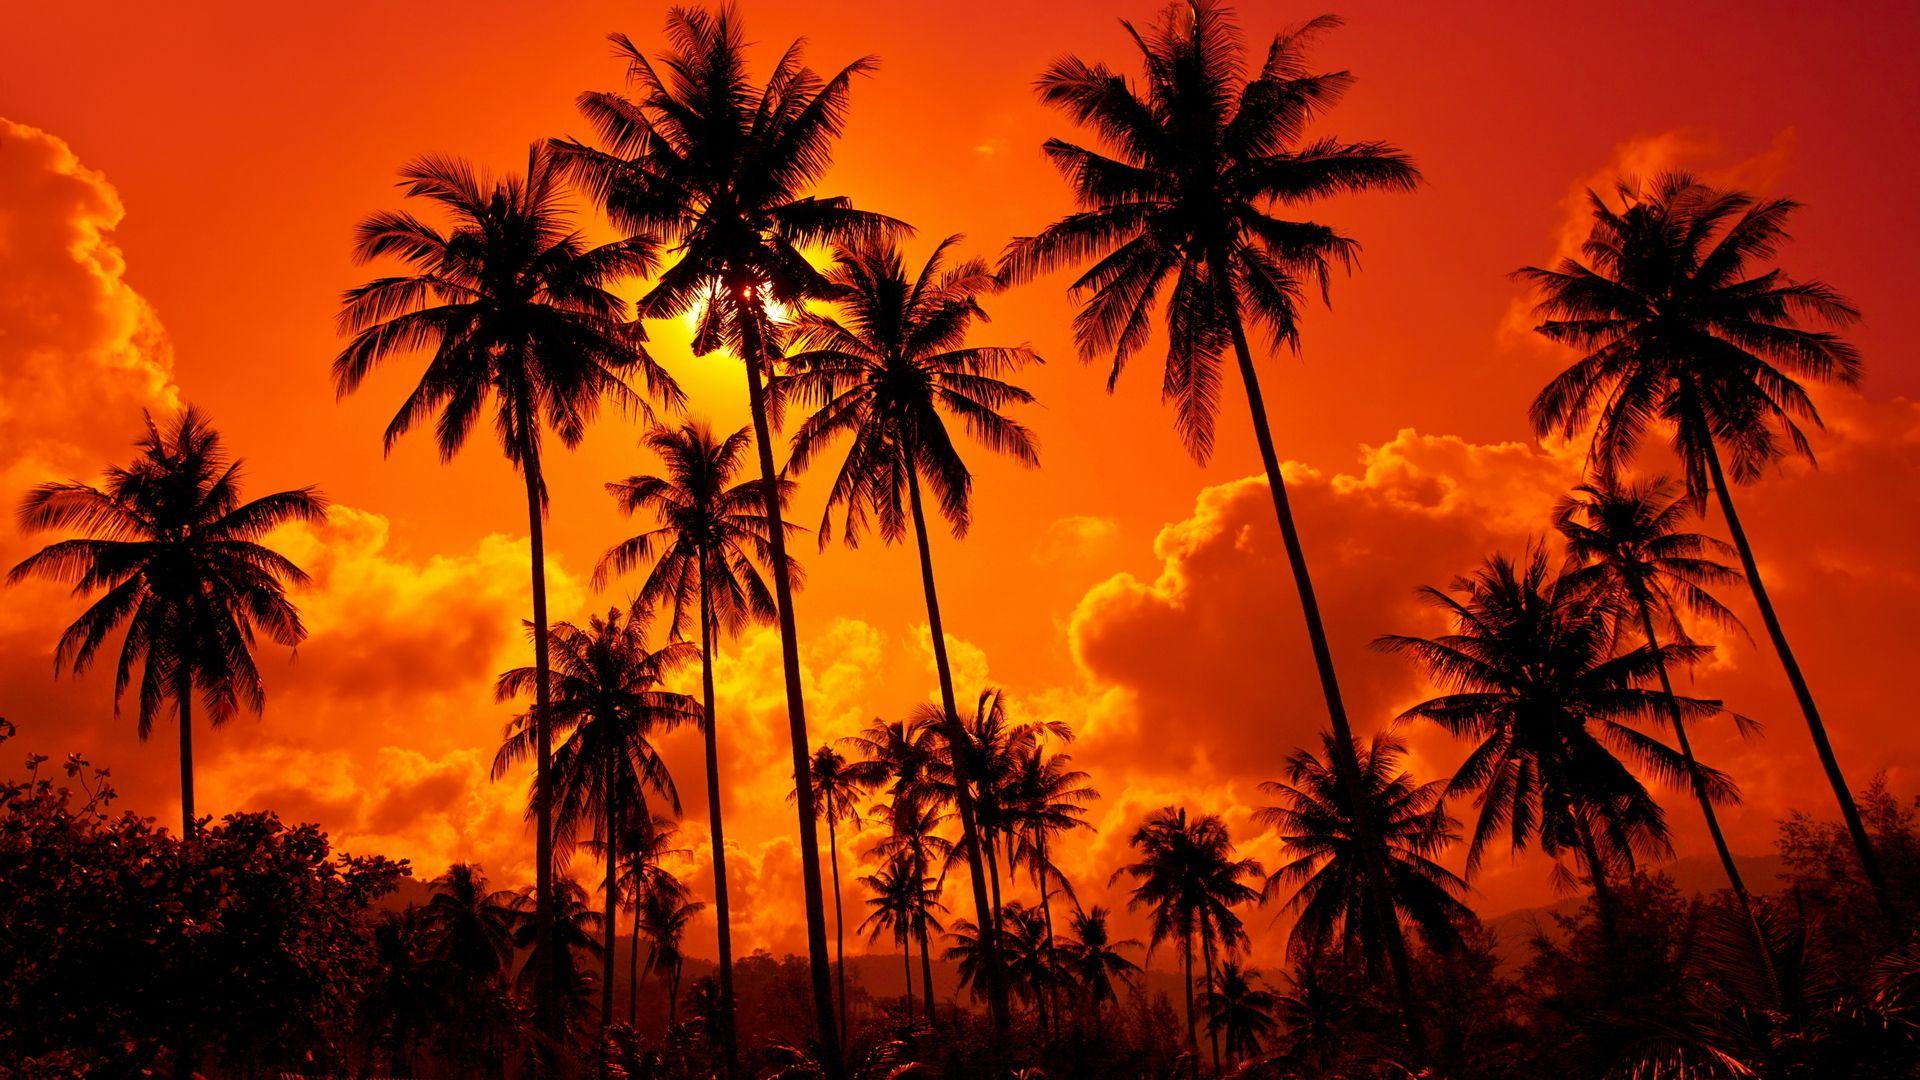 Aloha desktop wallpaper download